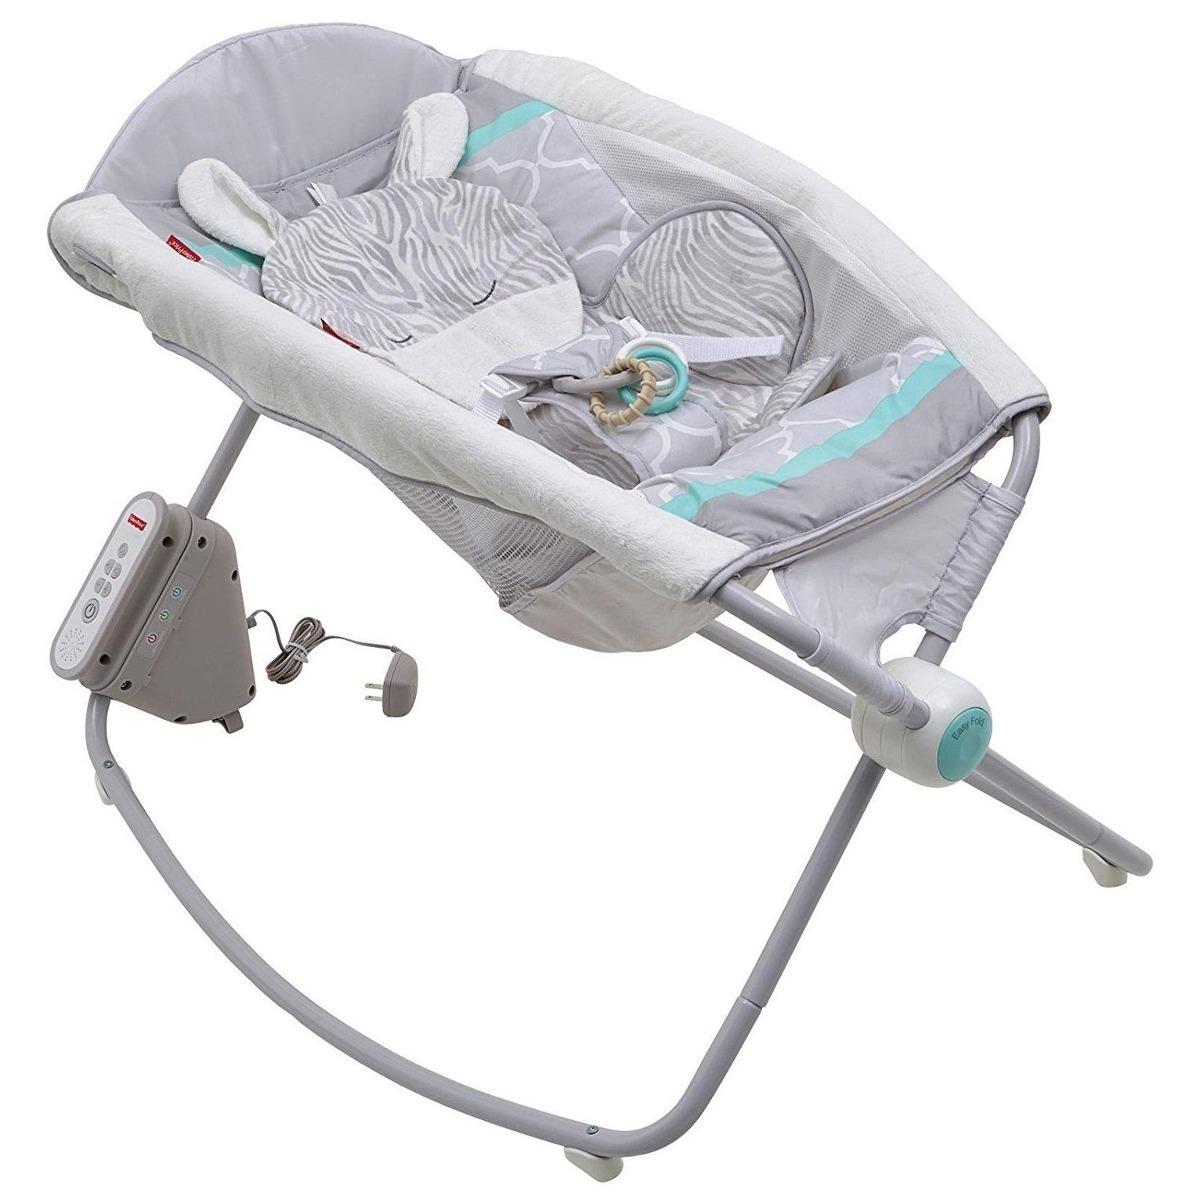 56ca28ff0 mecedora para dormir bebés recién nacido música fisher price. Cargando zoom.